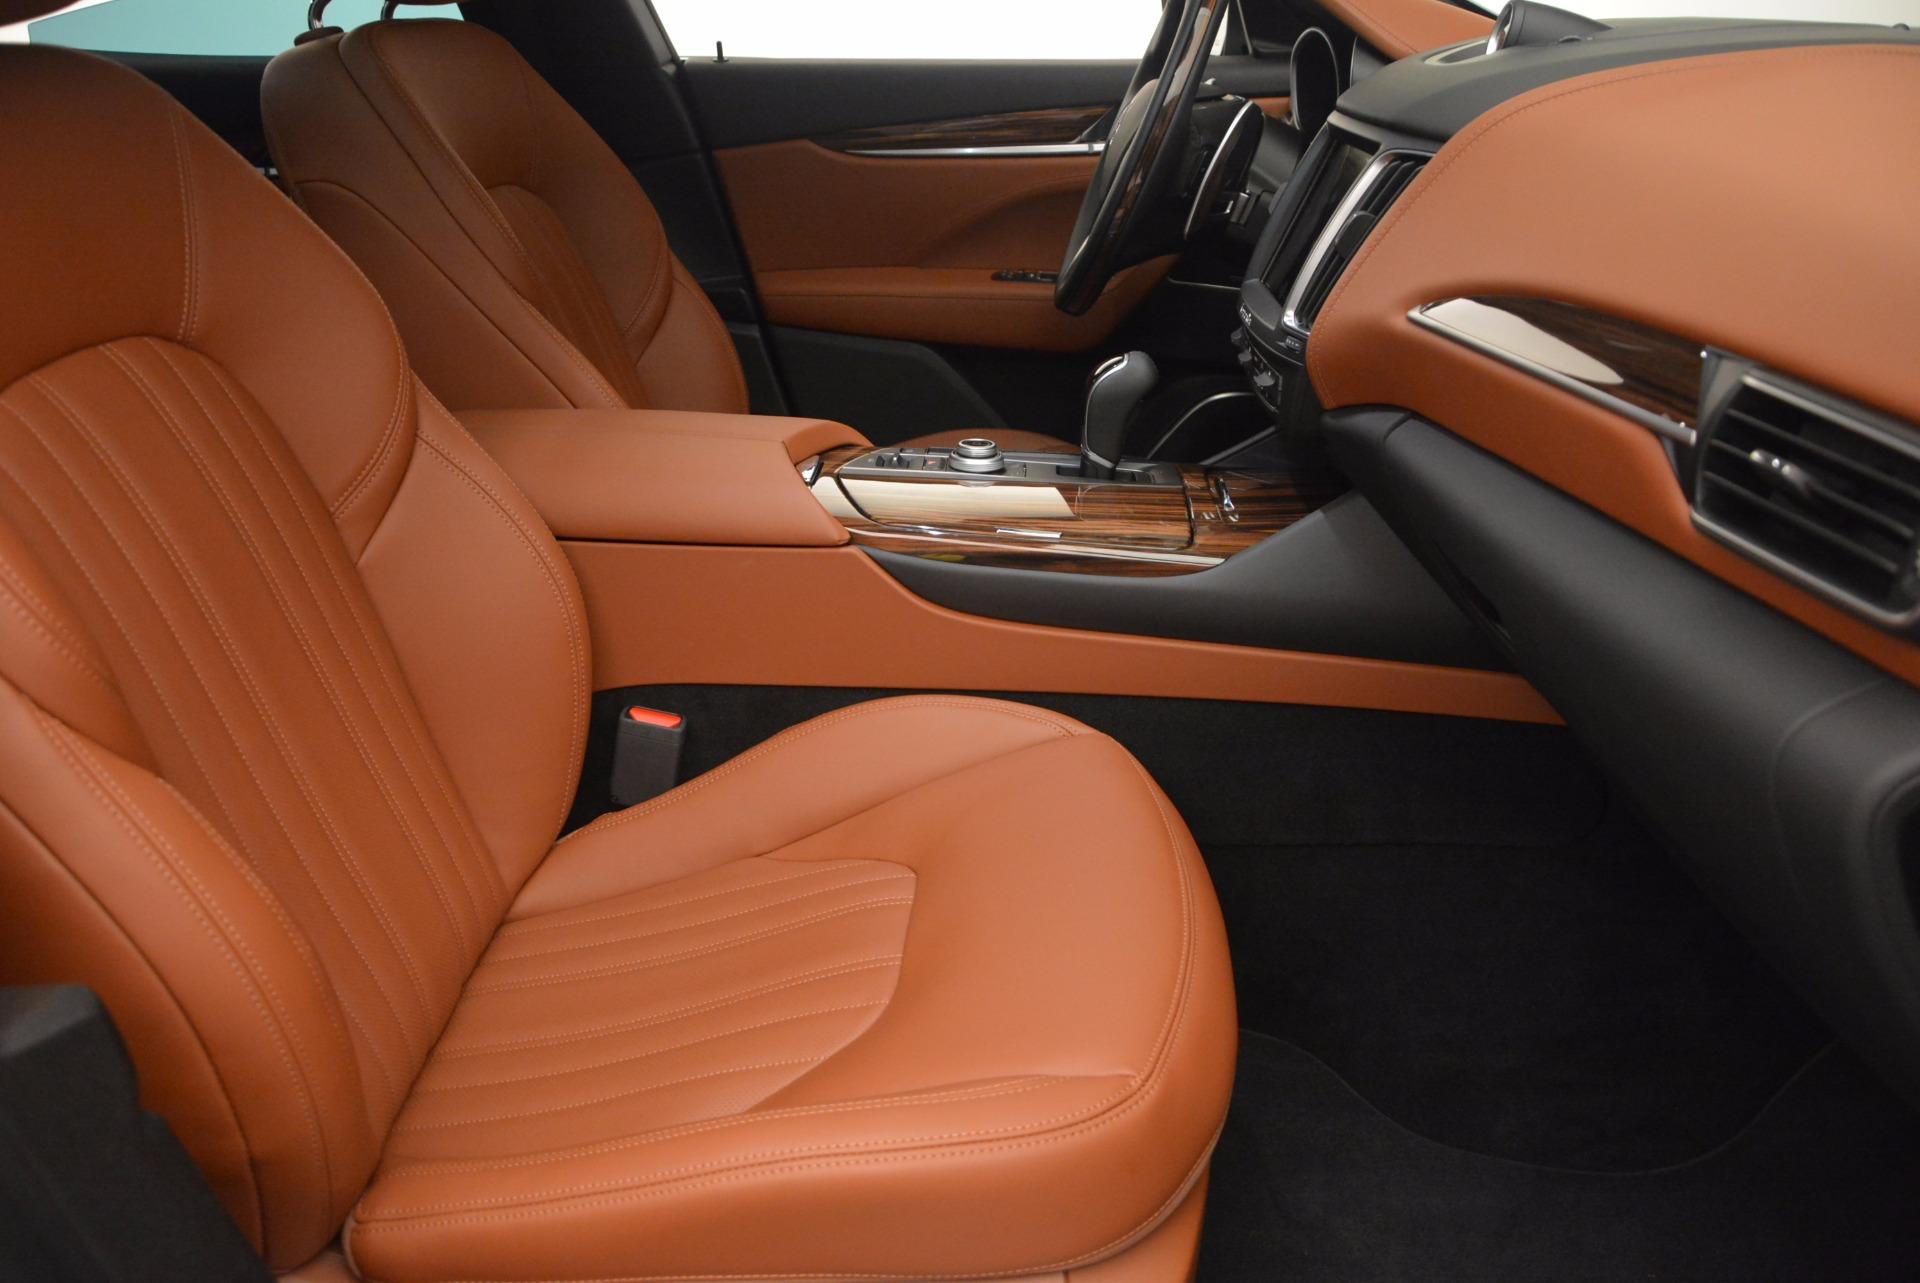 Used 2017 Maserati Levante S For Sale In Westport, CT 752_p27